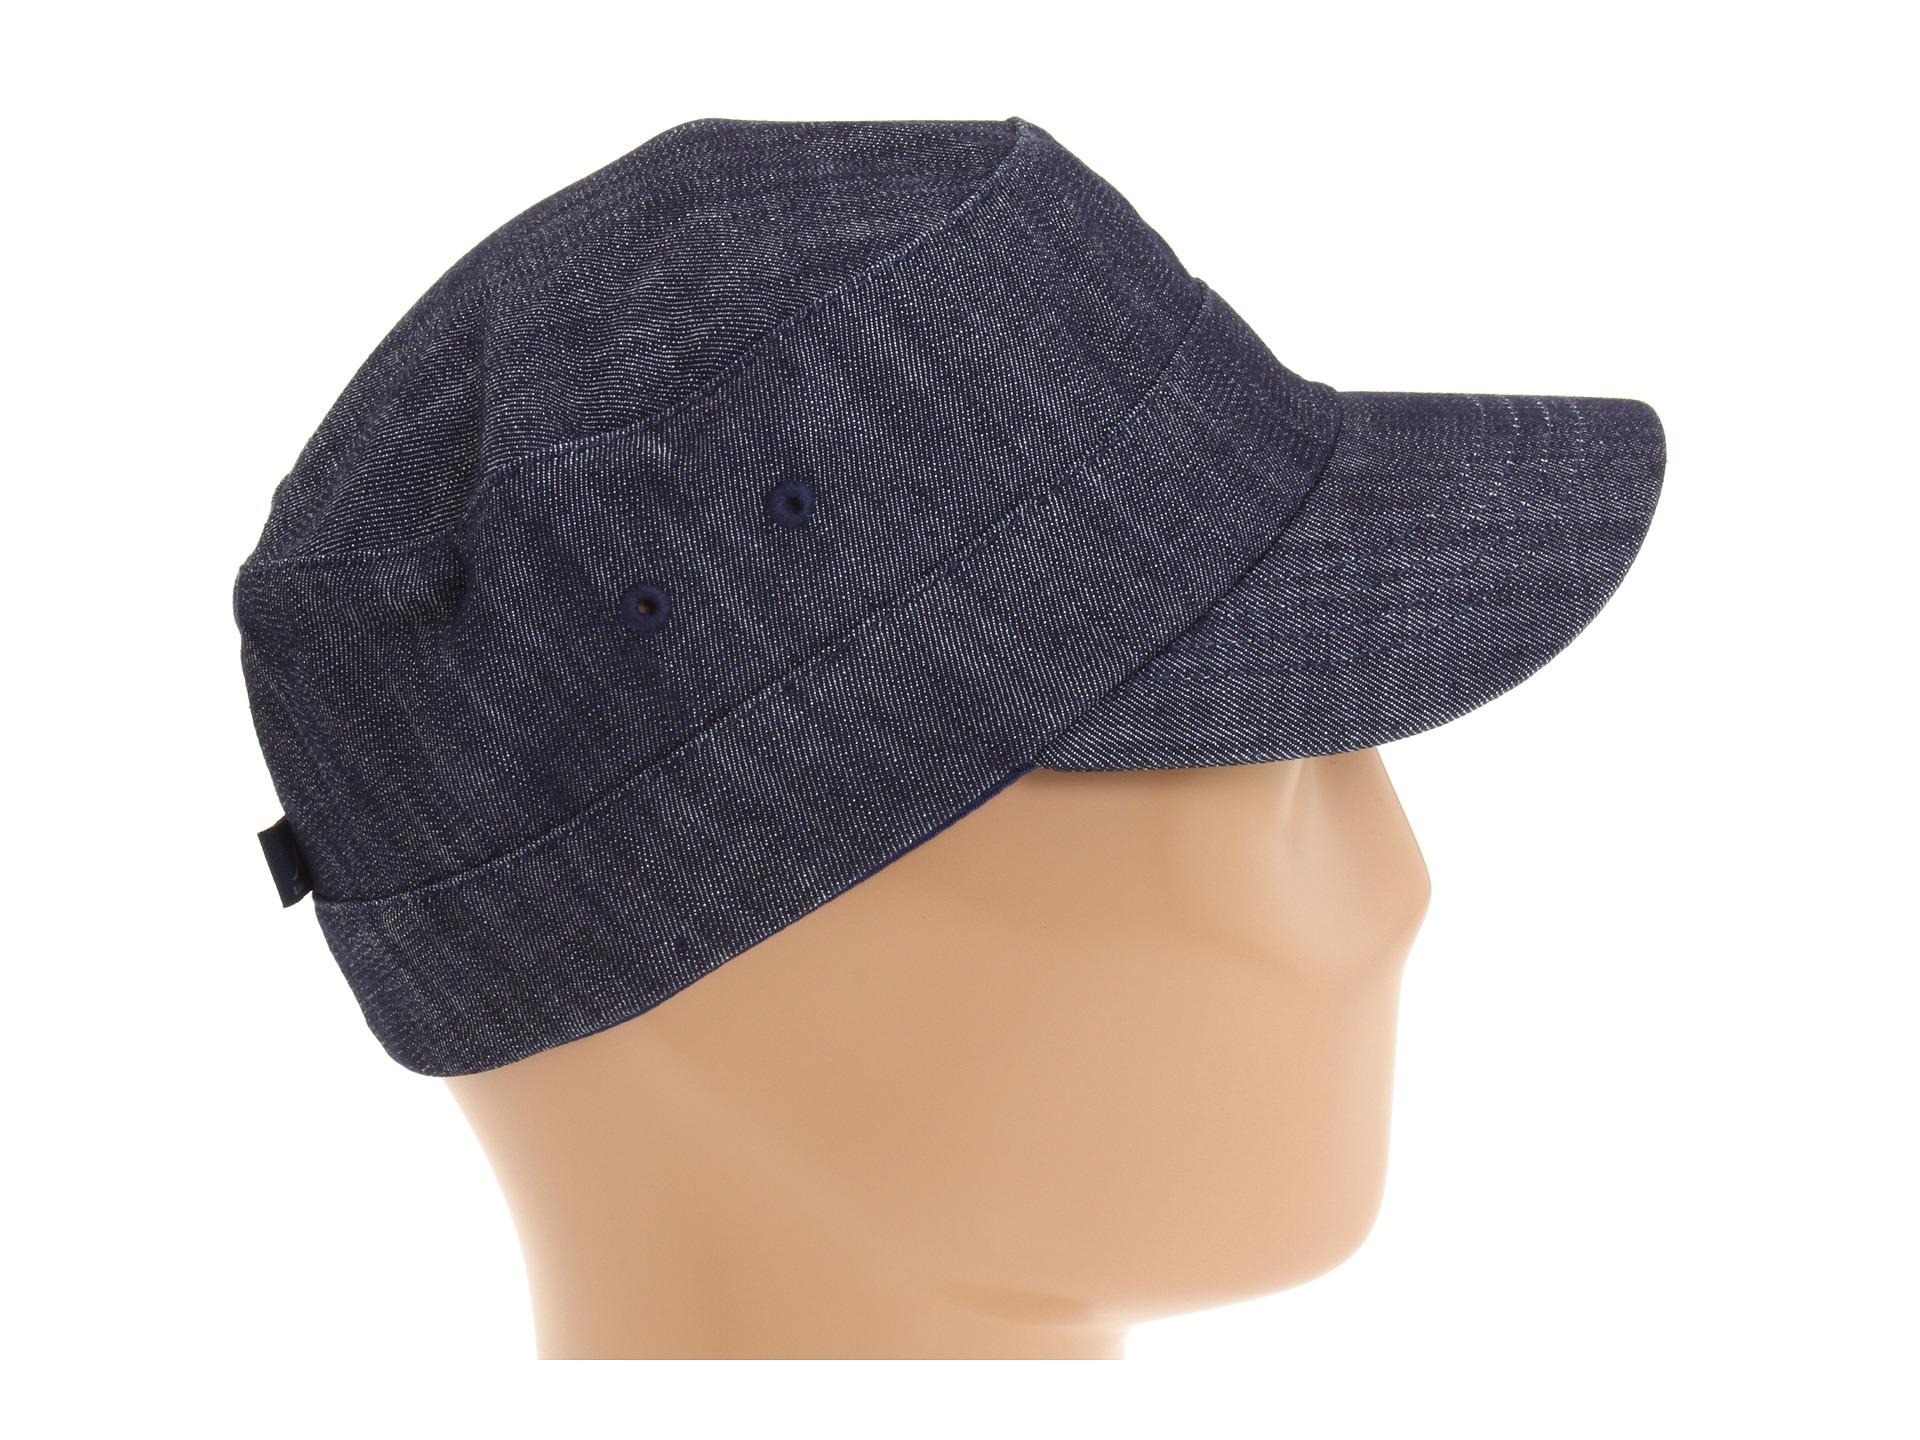 76eff38e530 Lyst - Kangol Denim Army Cap in Blue for Men